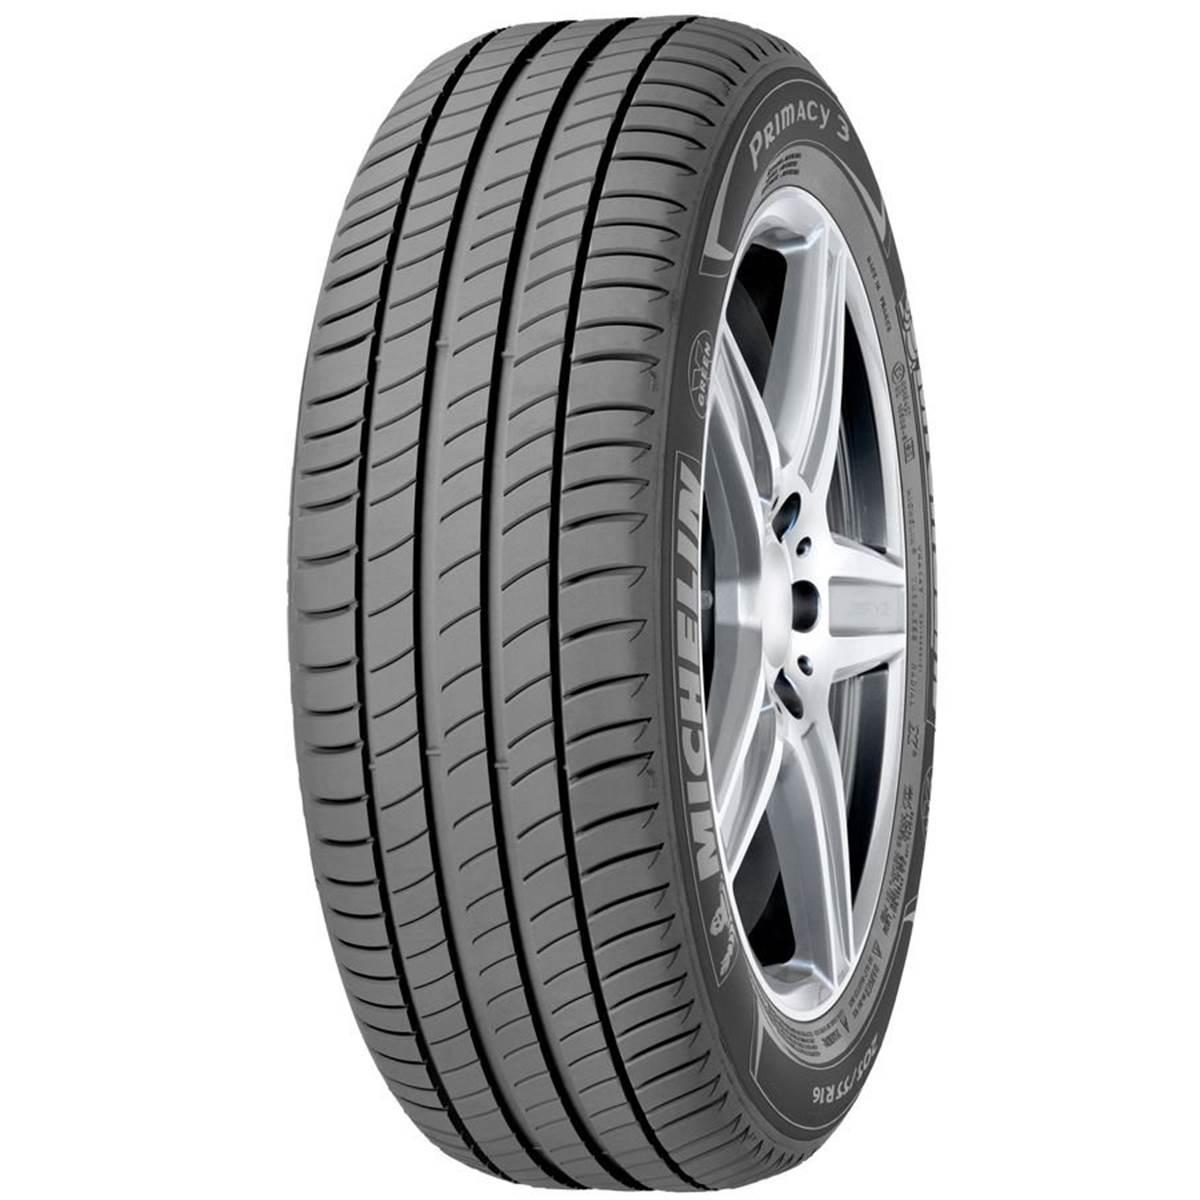 Pneu Michelin 205/55R16 91W Primacy 3